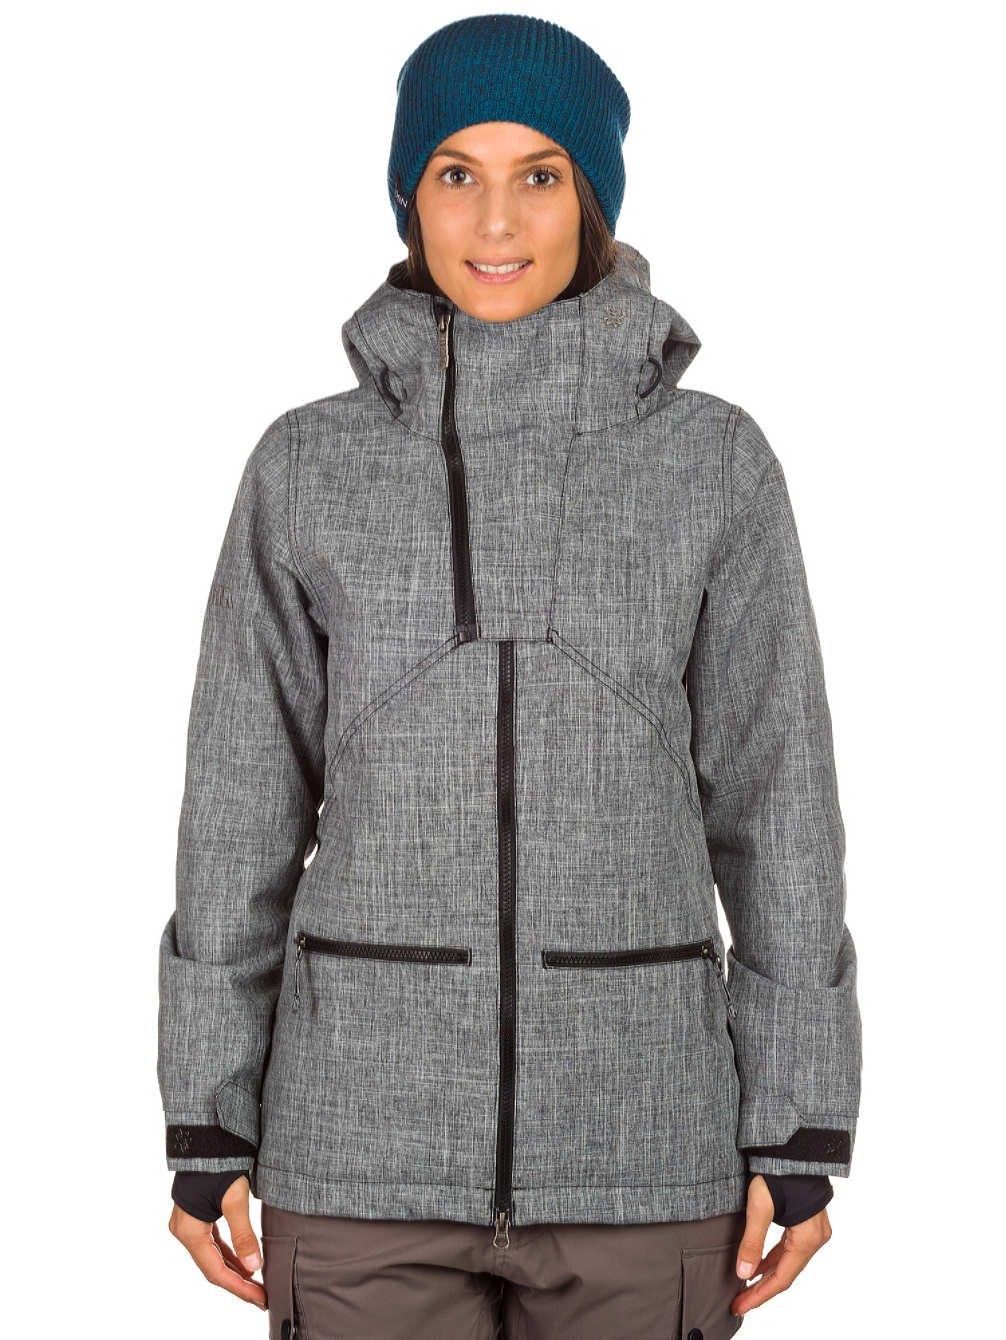 Damen Snowboard Jacke Nikita Hel (2-Tone) Jacket günstig